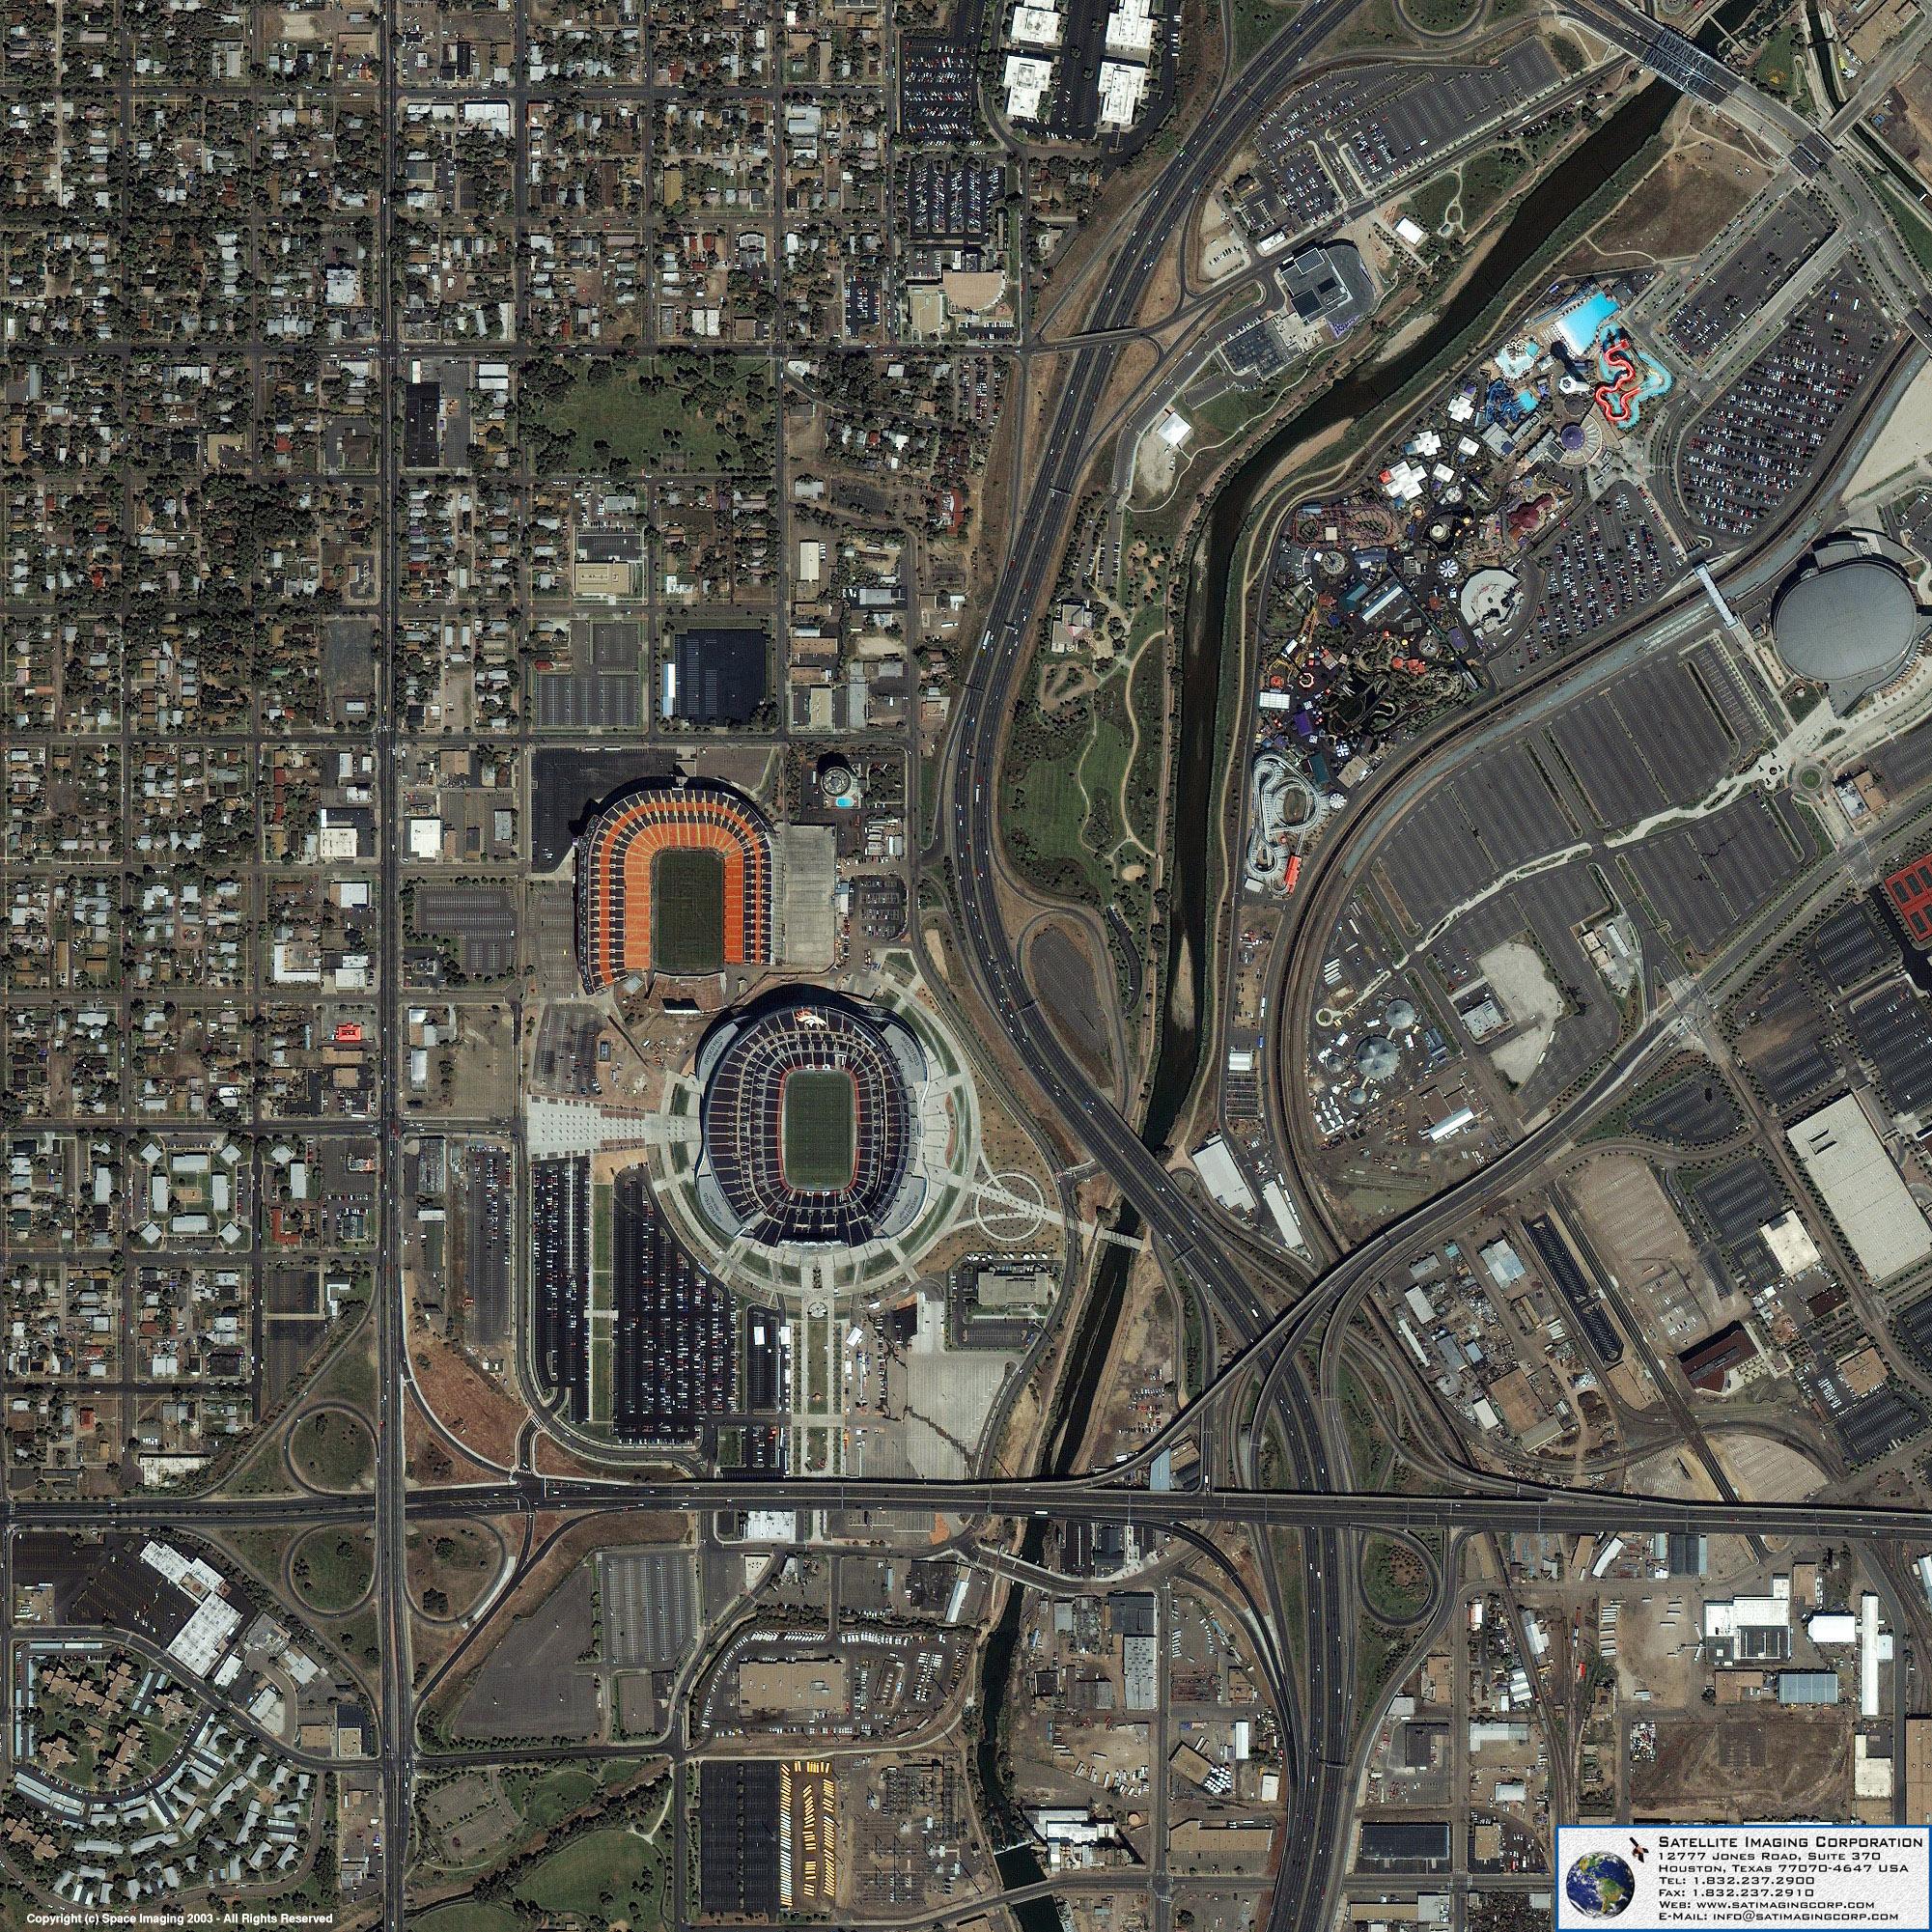 IKONOS Satellite Image Of Denver Colorado Satellite Imaging Corp - Satelite image